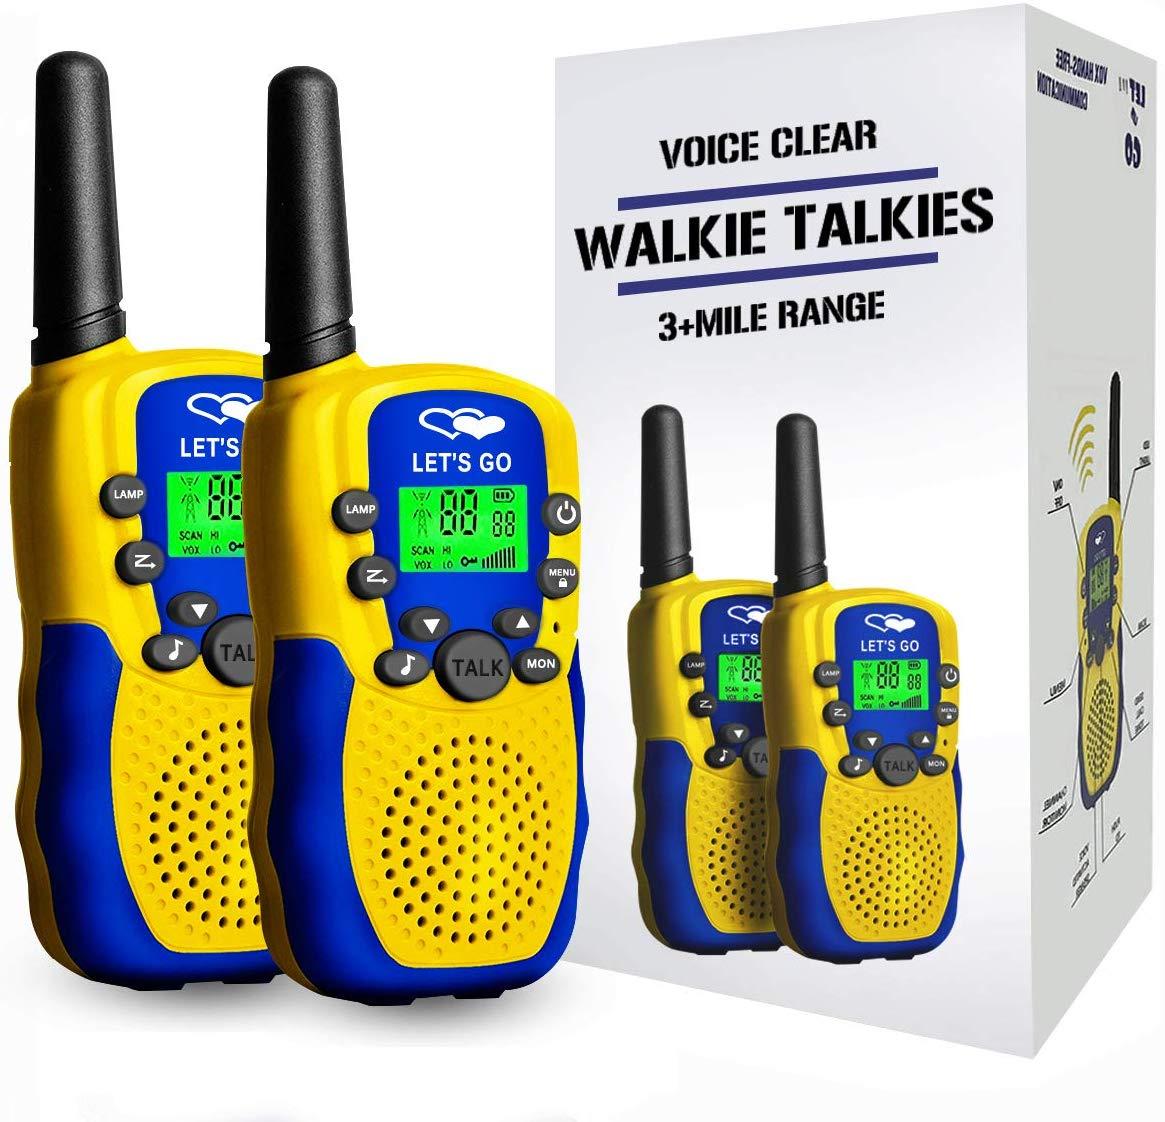 Tisy Long Range Walkie Talkies for Kids